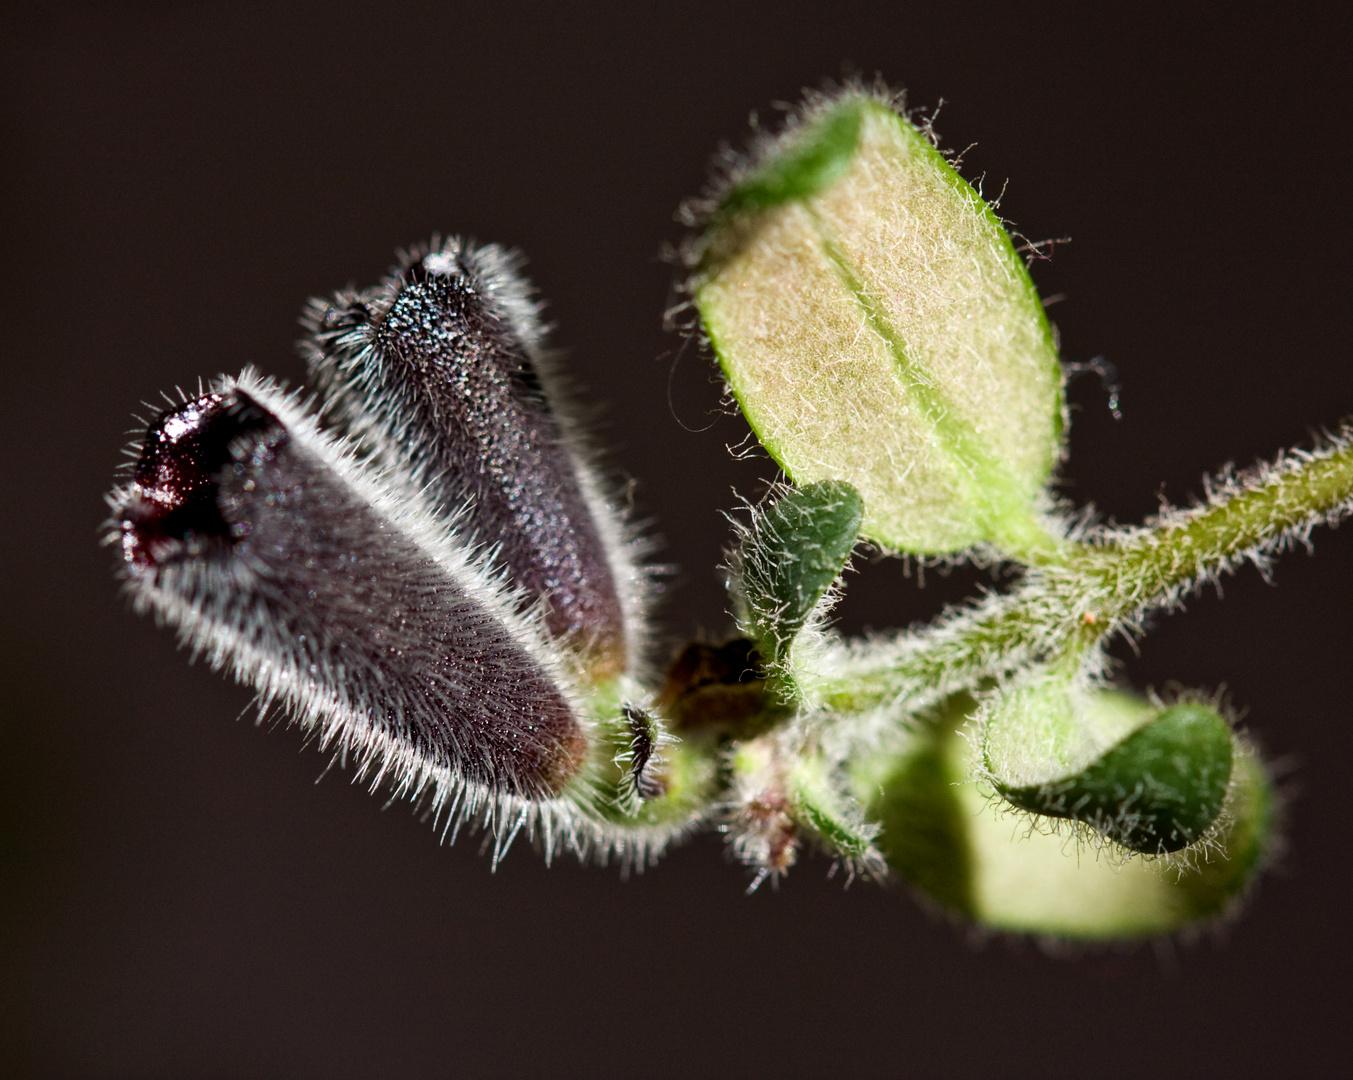 Aeschynanthus twister, lipstickplant, Aeschinantus